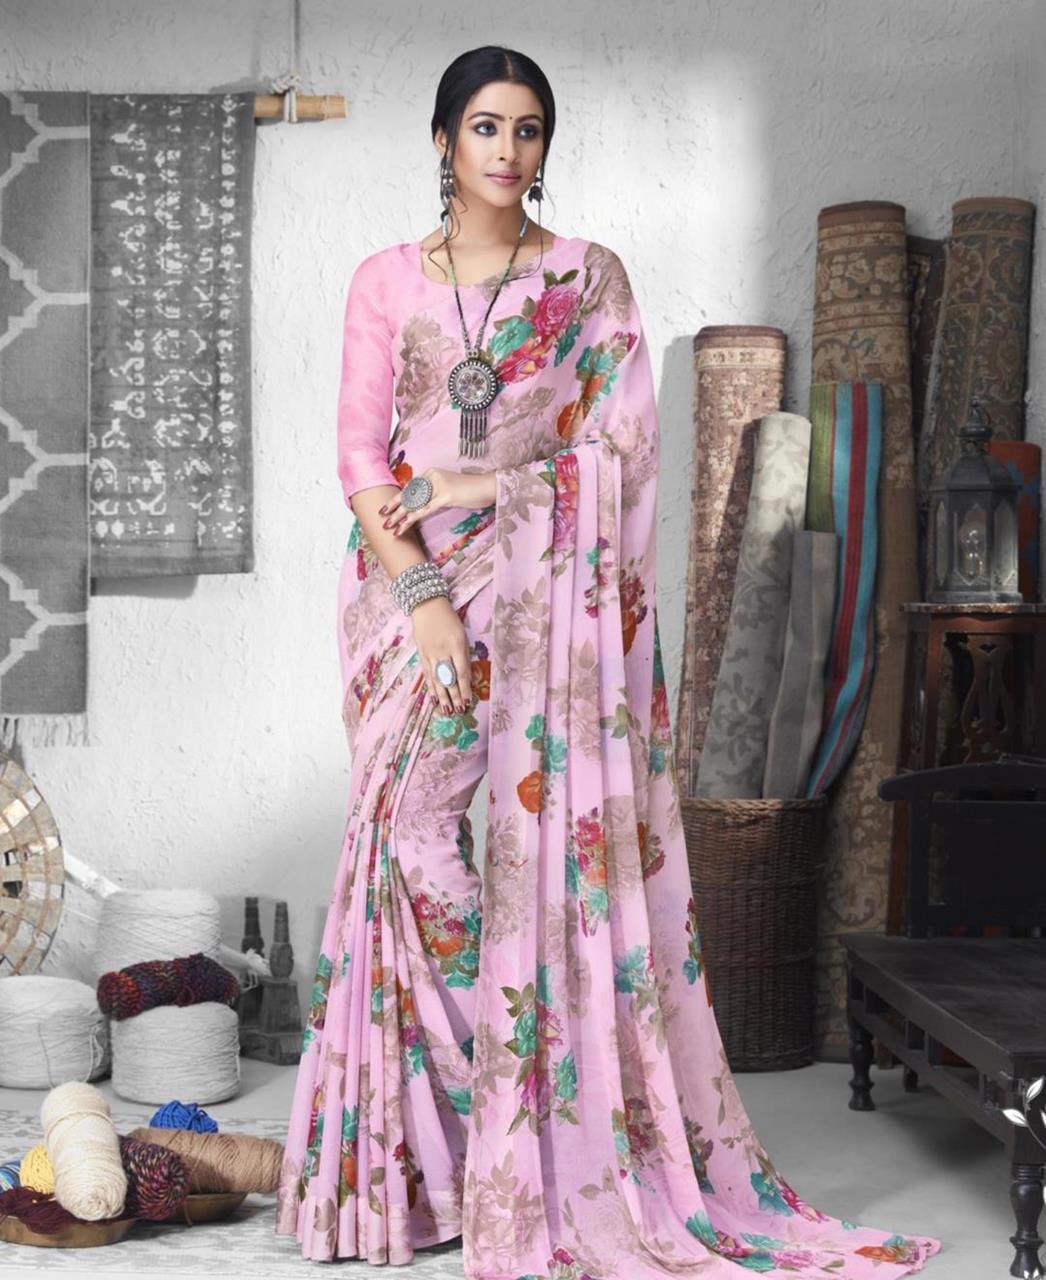 Printed Chiffon Saree in Light Pink